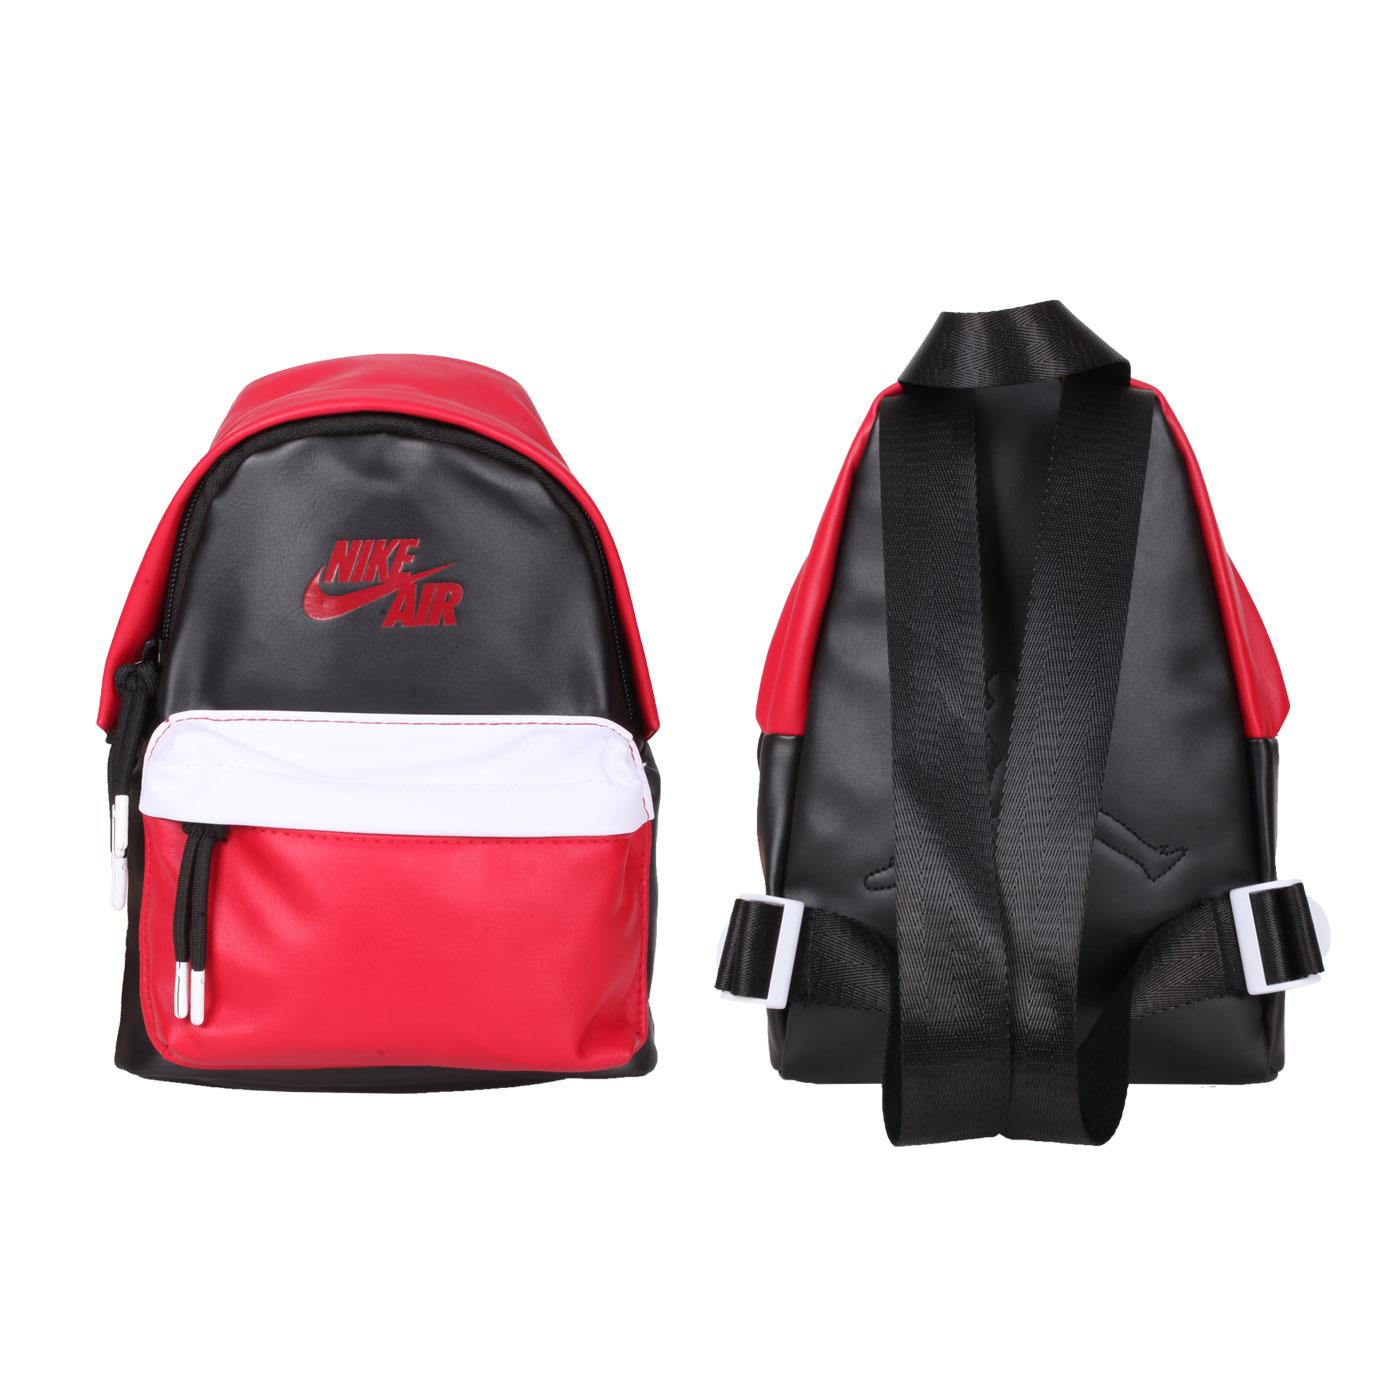 NIKE JORDAN 小型雙肩包 JD2113010TD-001